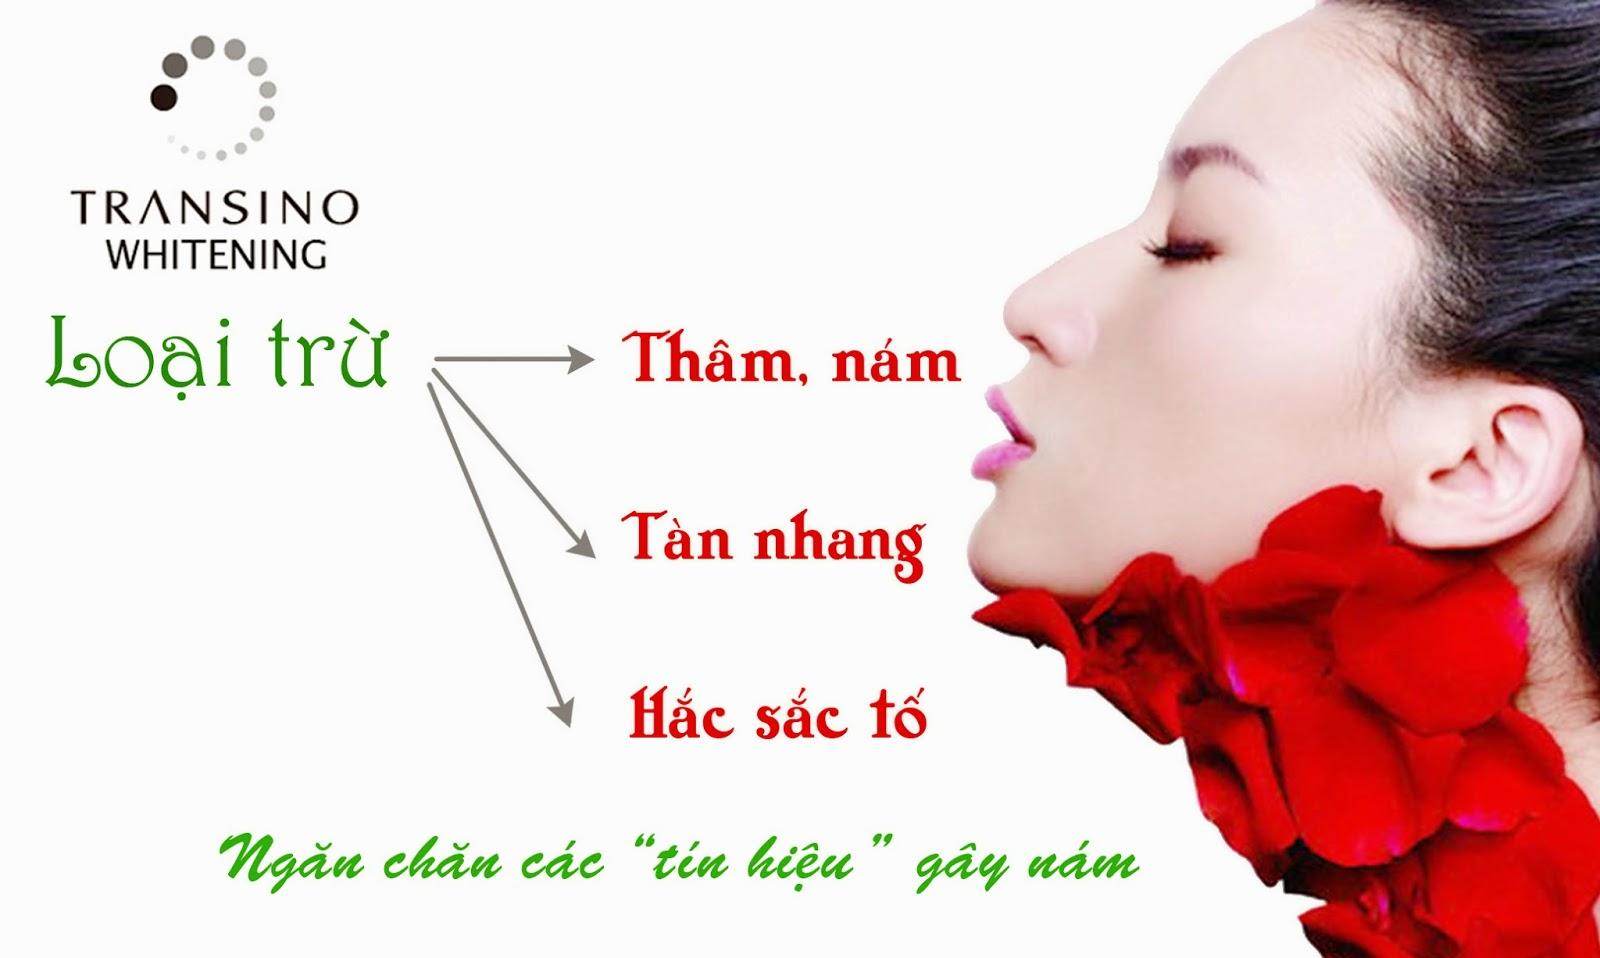 http://www.transinowhitening.com/2014/10/transino-san-pham-em-lai-ve-ep-hoan-my.html